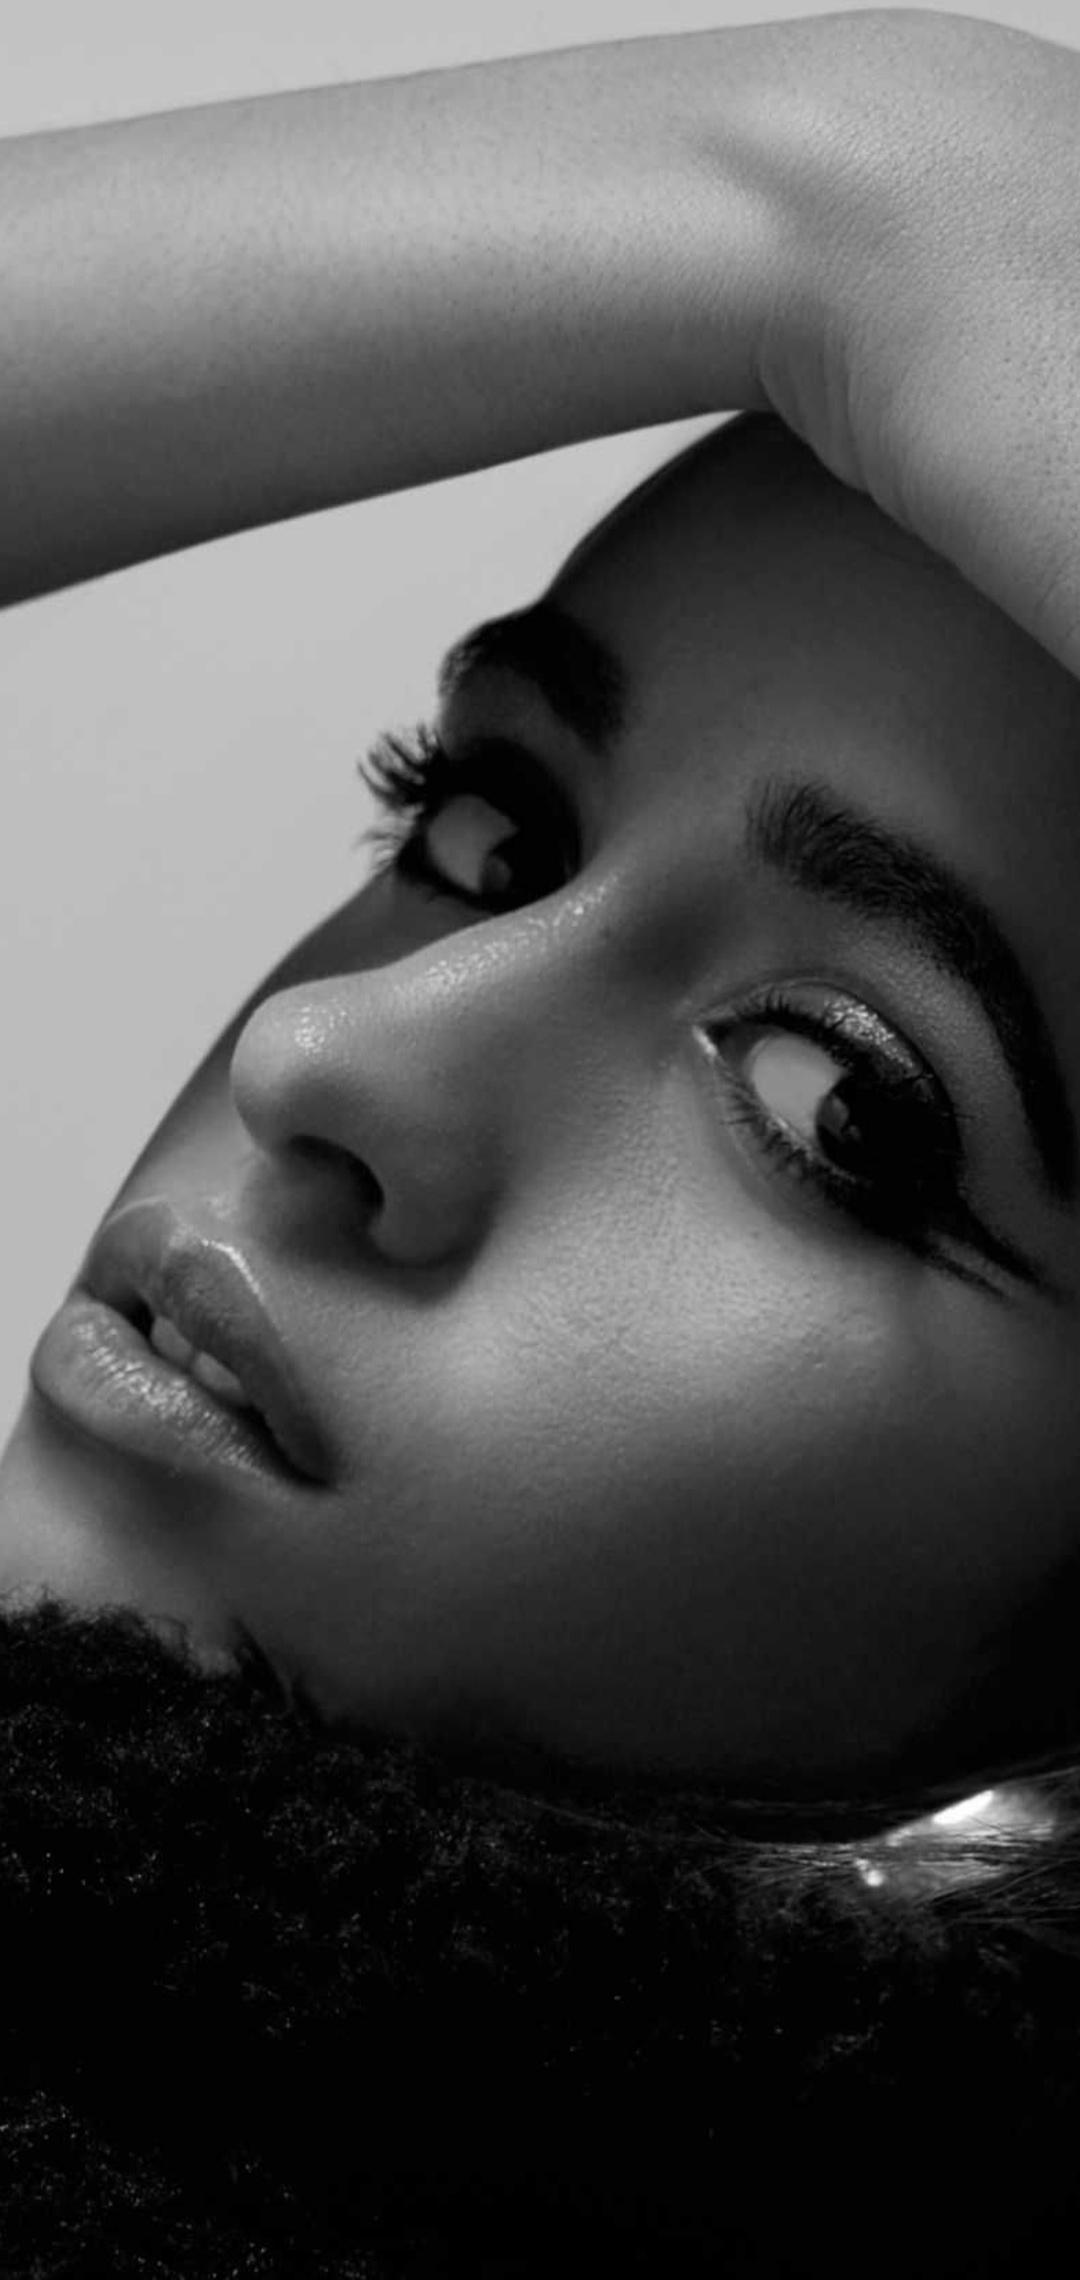 camila-cabello-fault-magazine-photoshoot-2018-h9.jpg